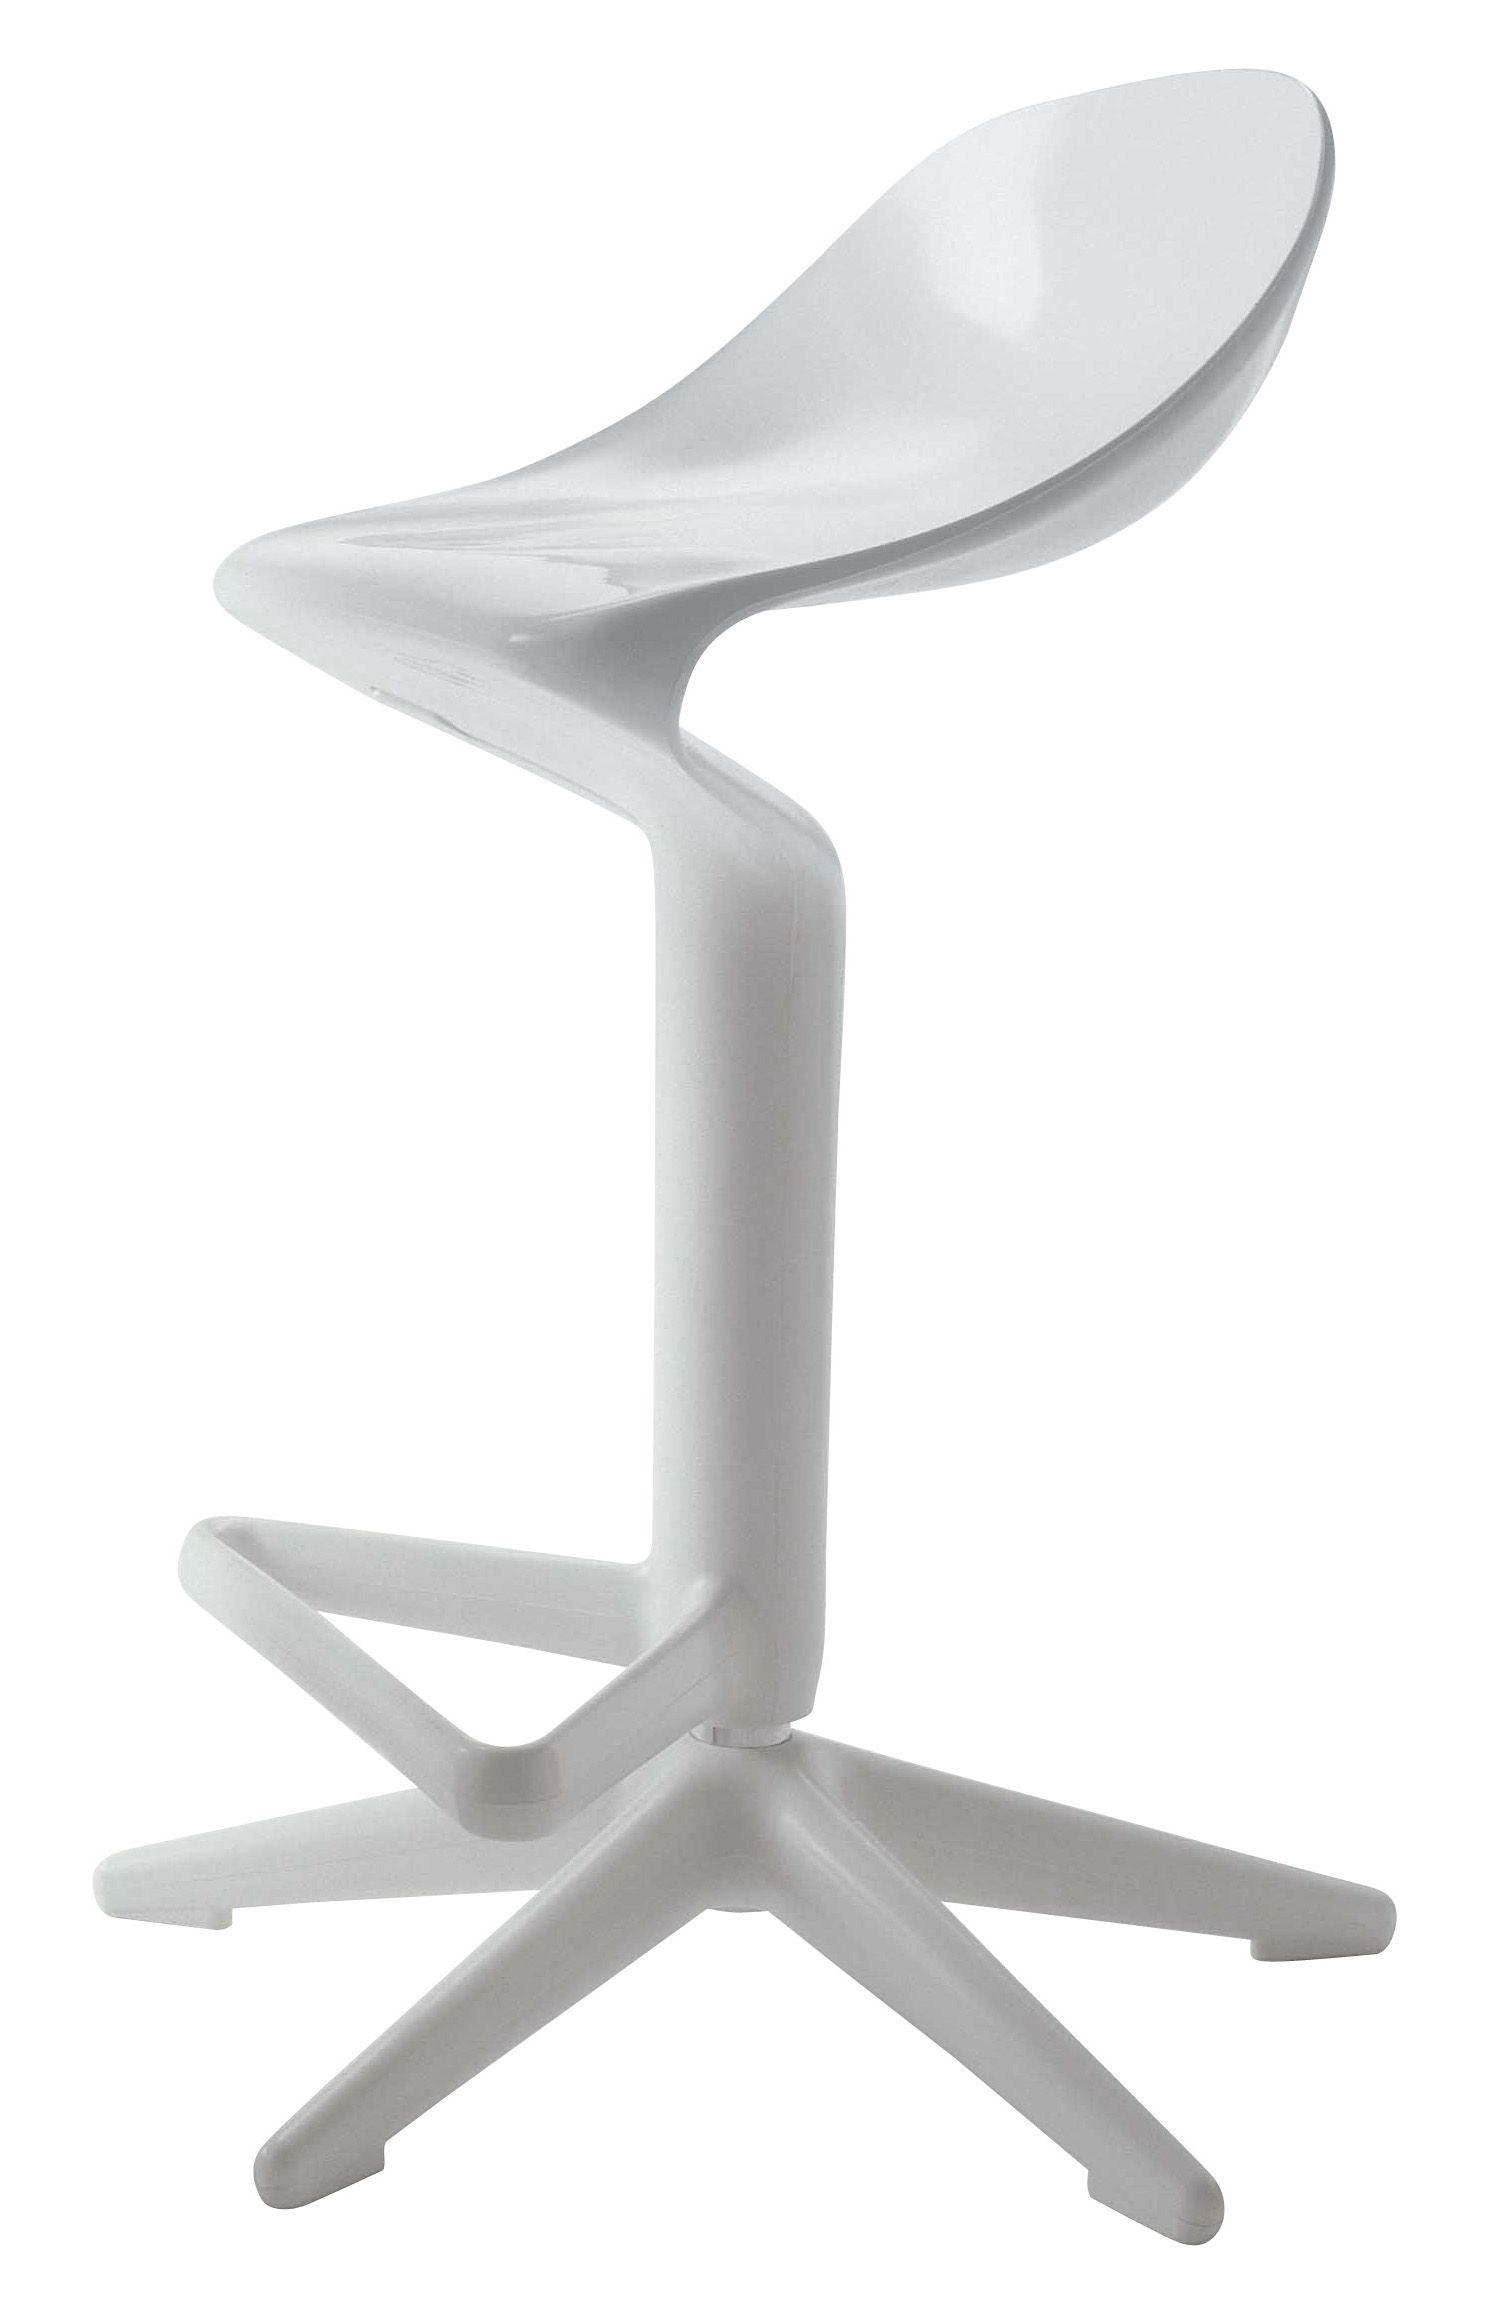 tabouret haut r glable spoon pivotant plastique blanc kartell. Black Bedroom Furniture Sets. Home Design Ideas